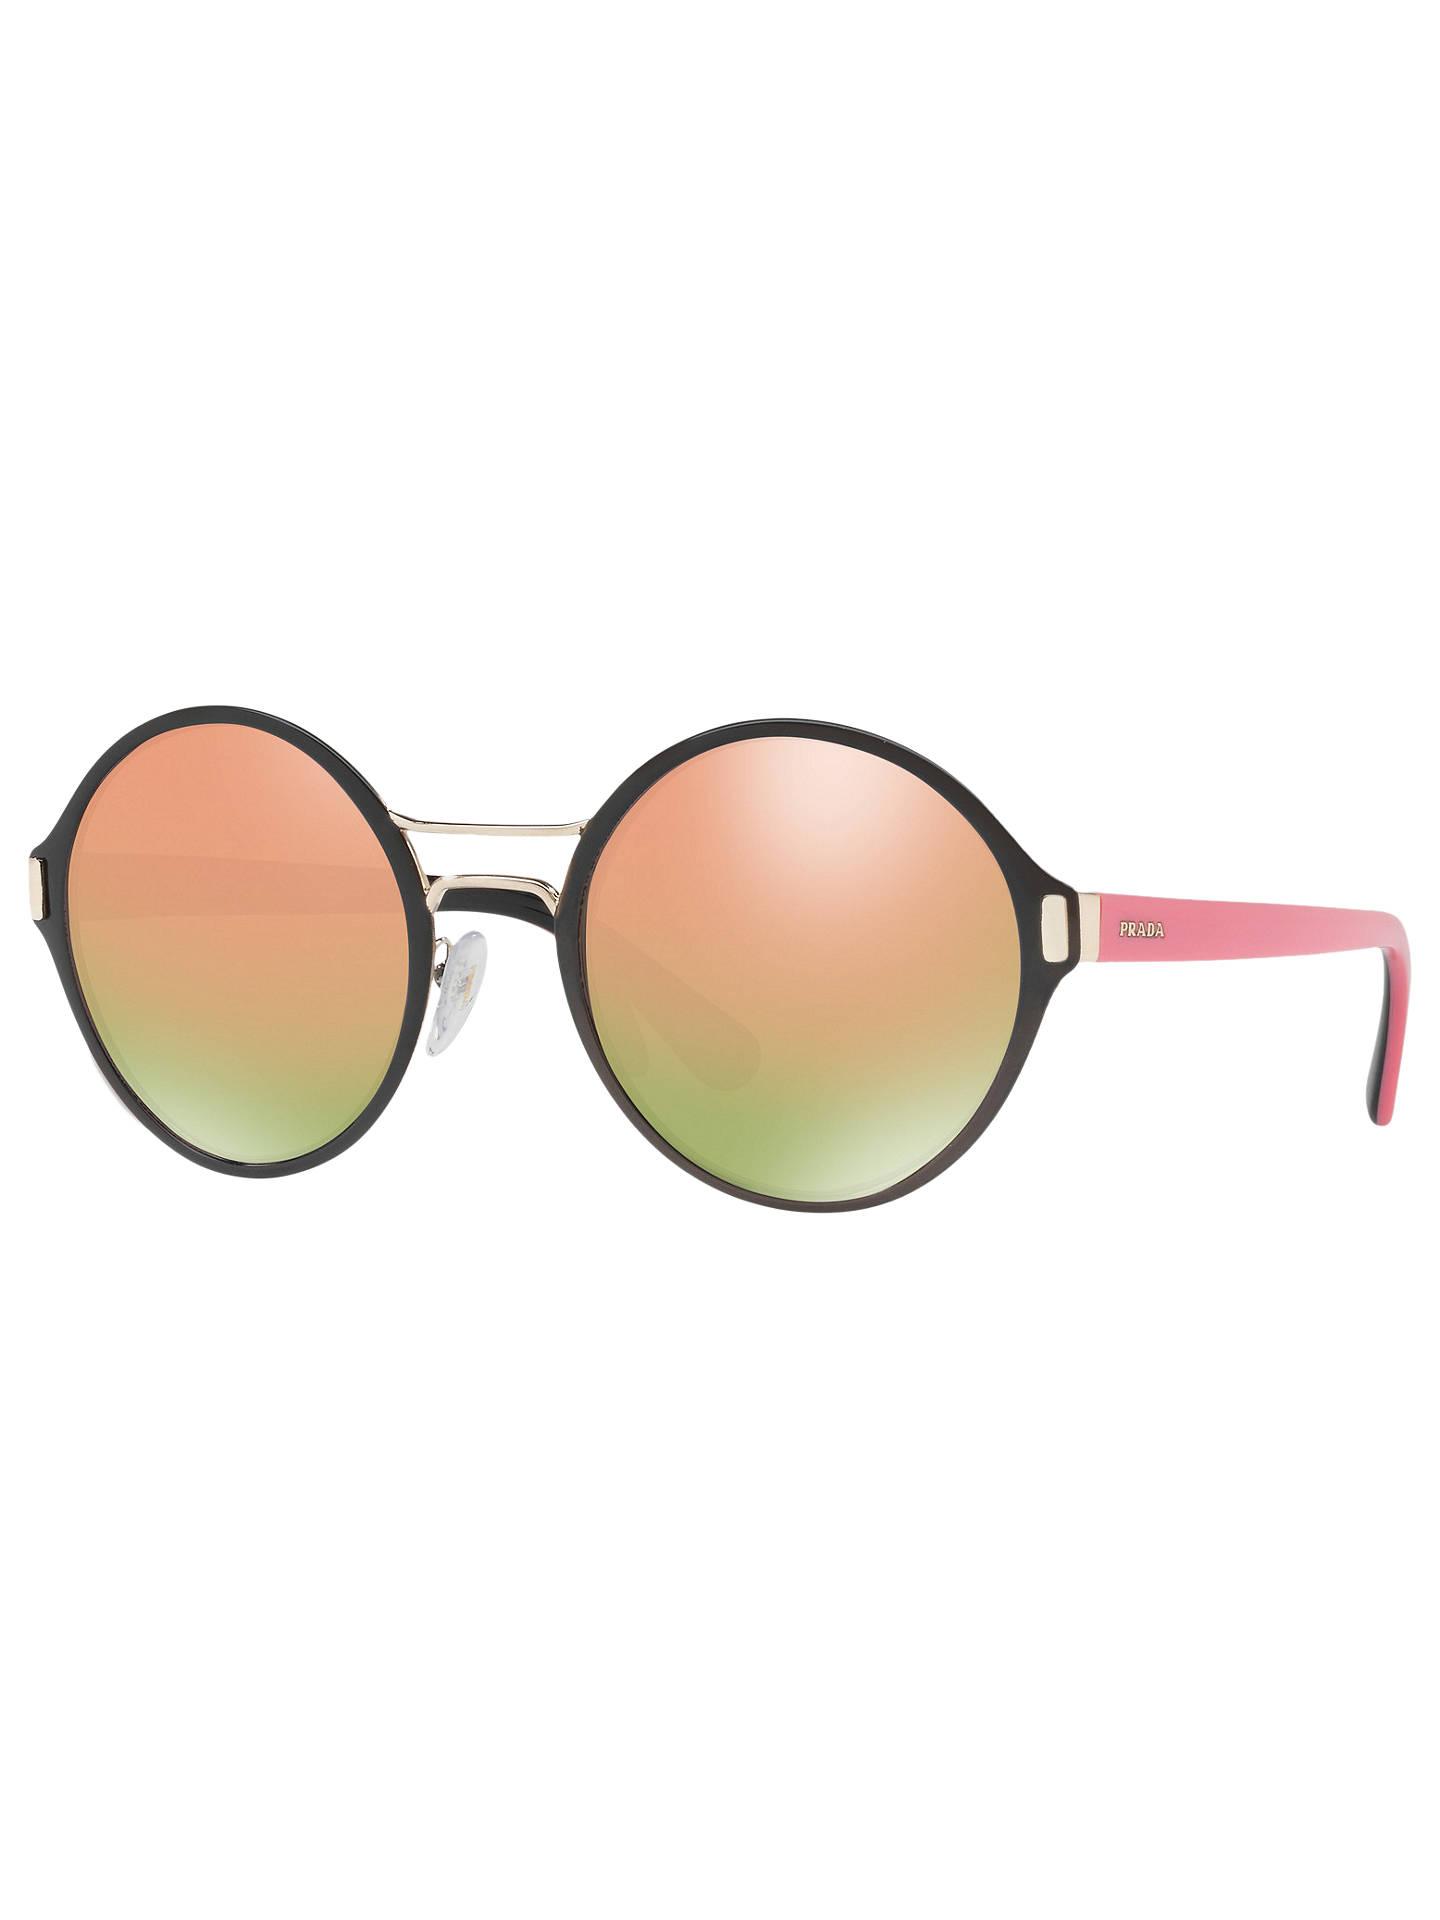 eaad9141d0c7d Prada PR 57TS Round Sunglasses at John Lewis   Partners